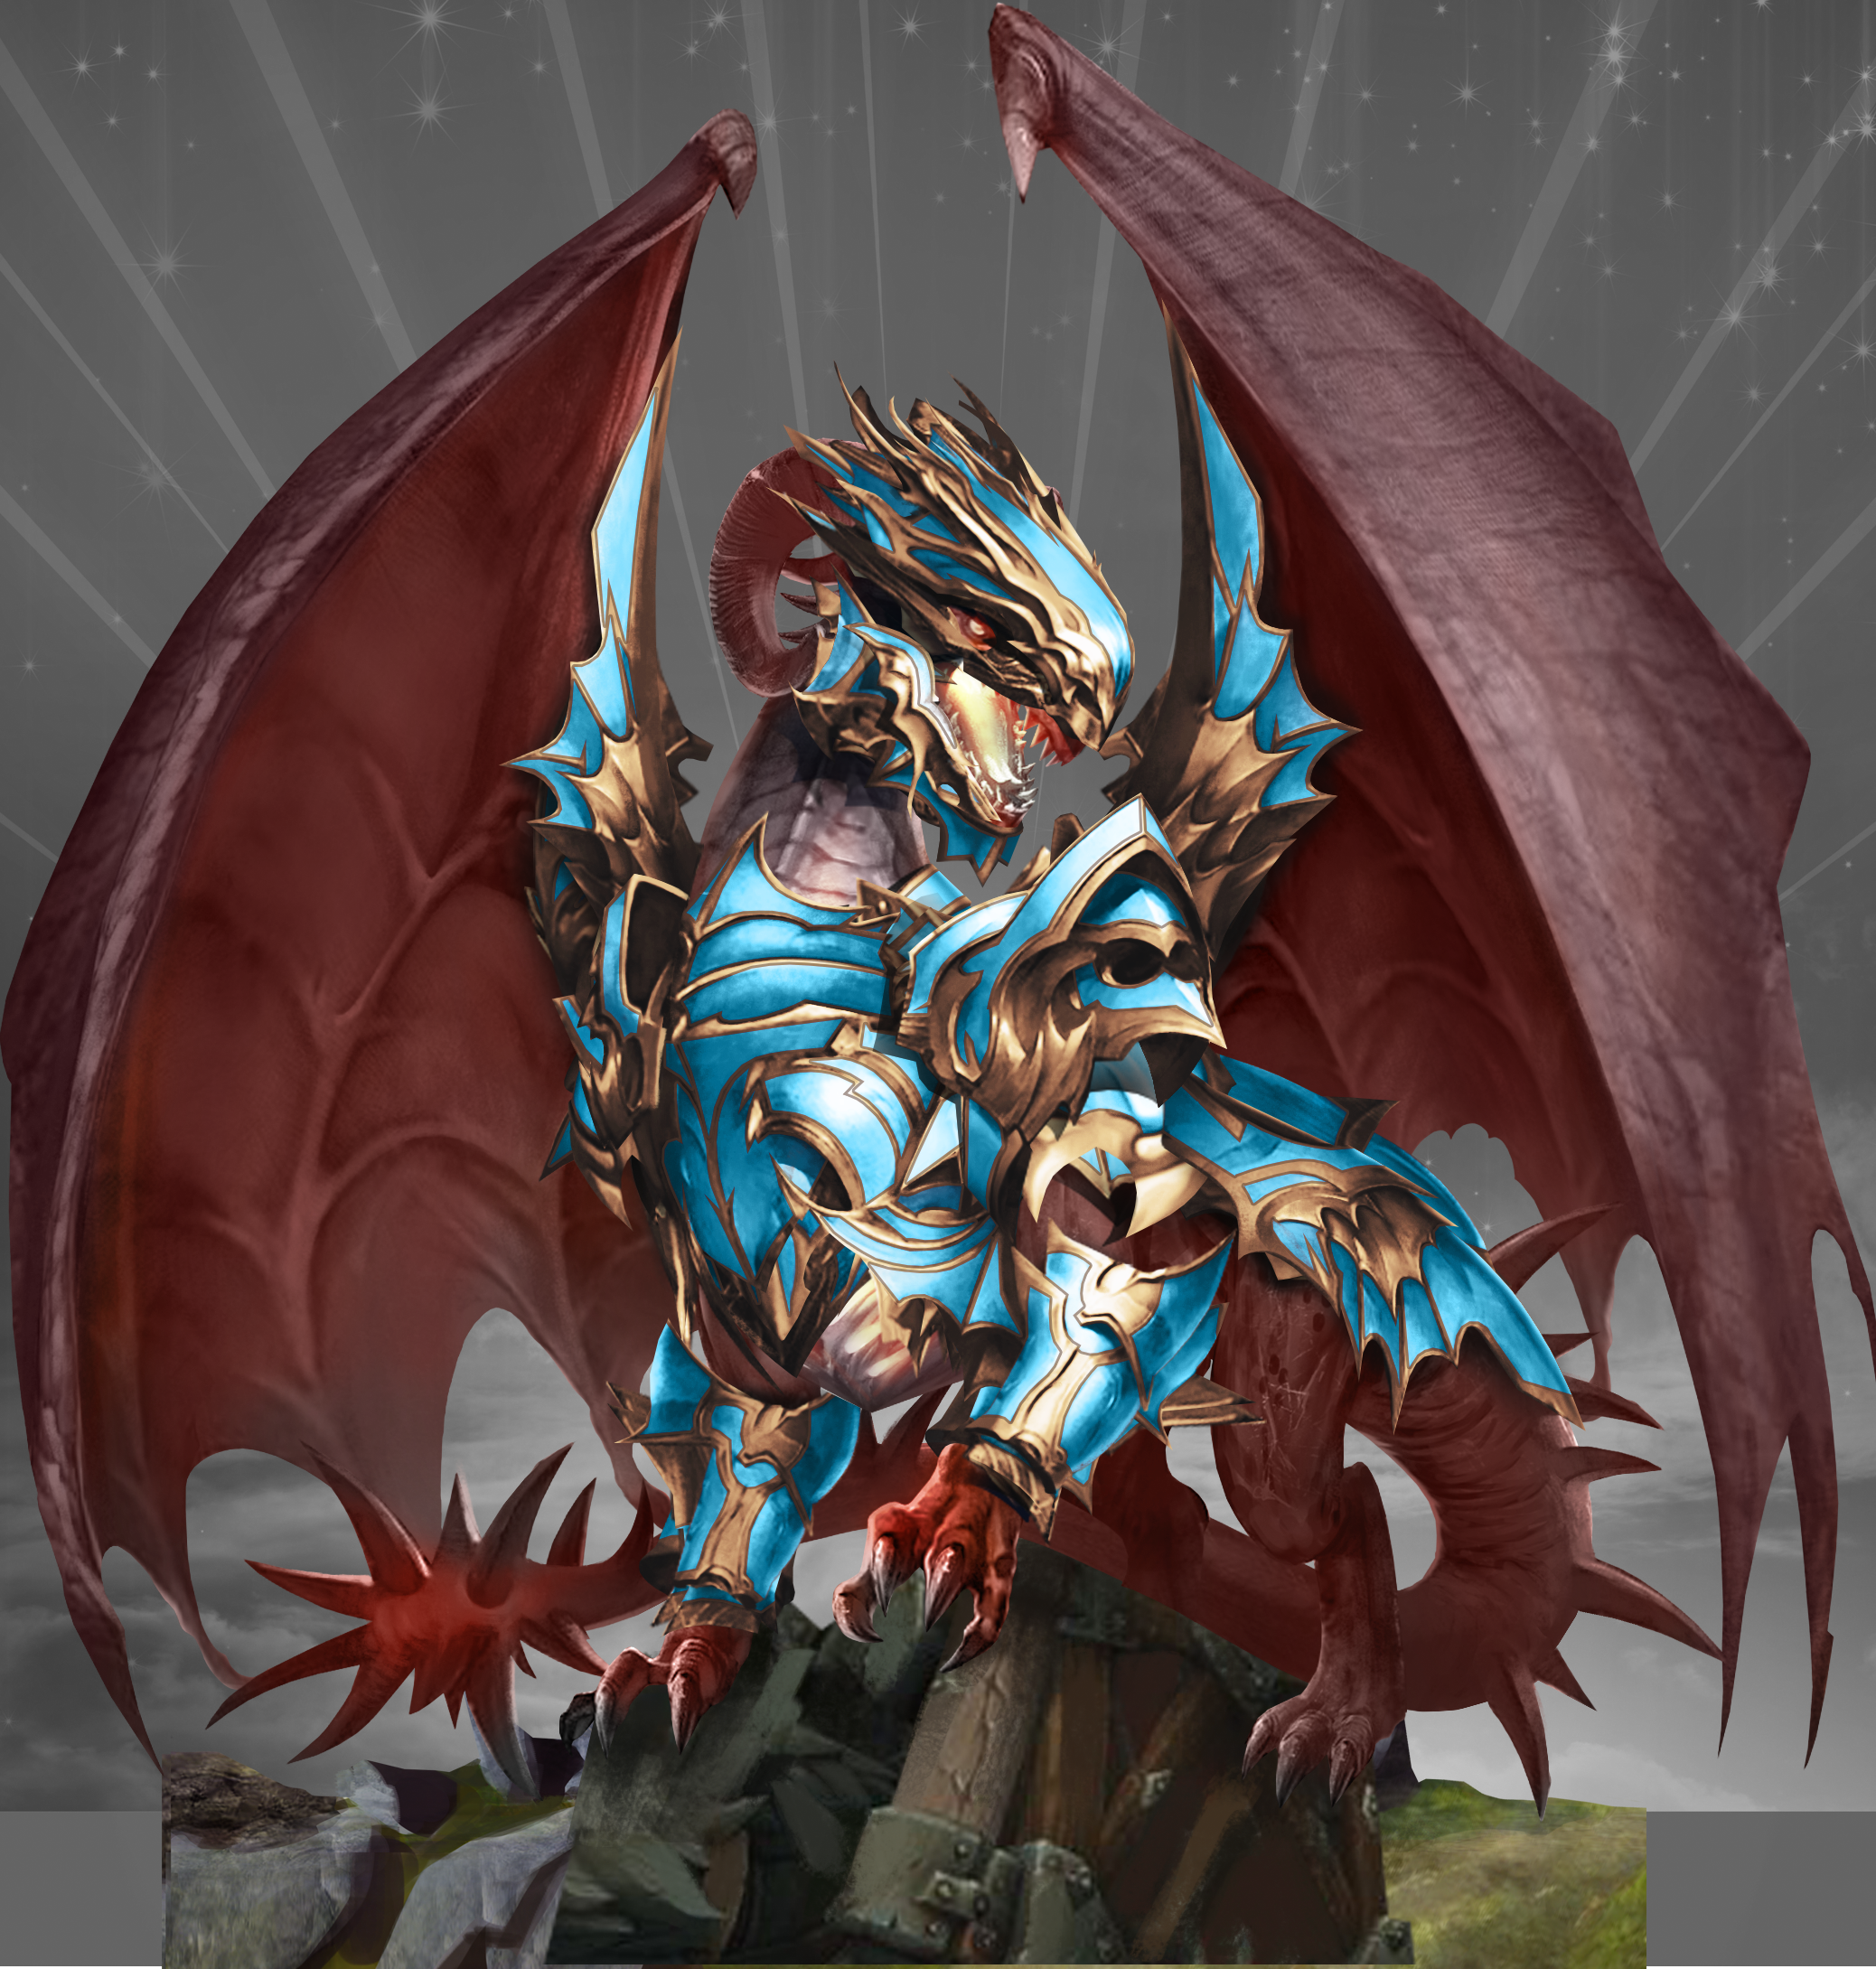 Drakewars Dragon In Armor Dragon Armor Halloween Wreath Elder dragon by xxfuria on deviantart. pinterest